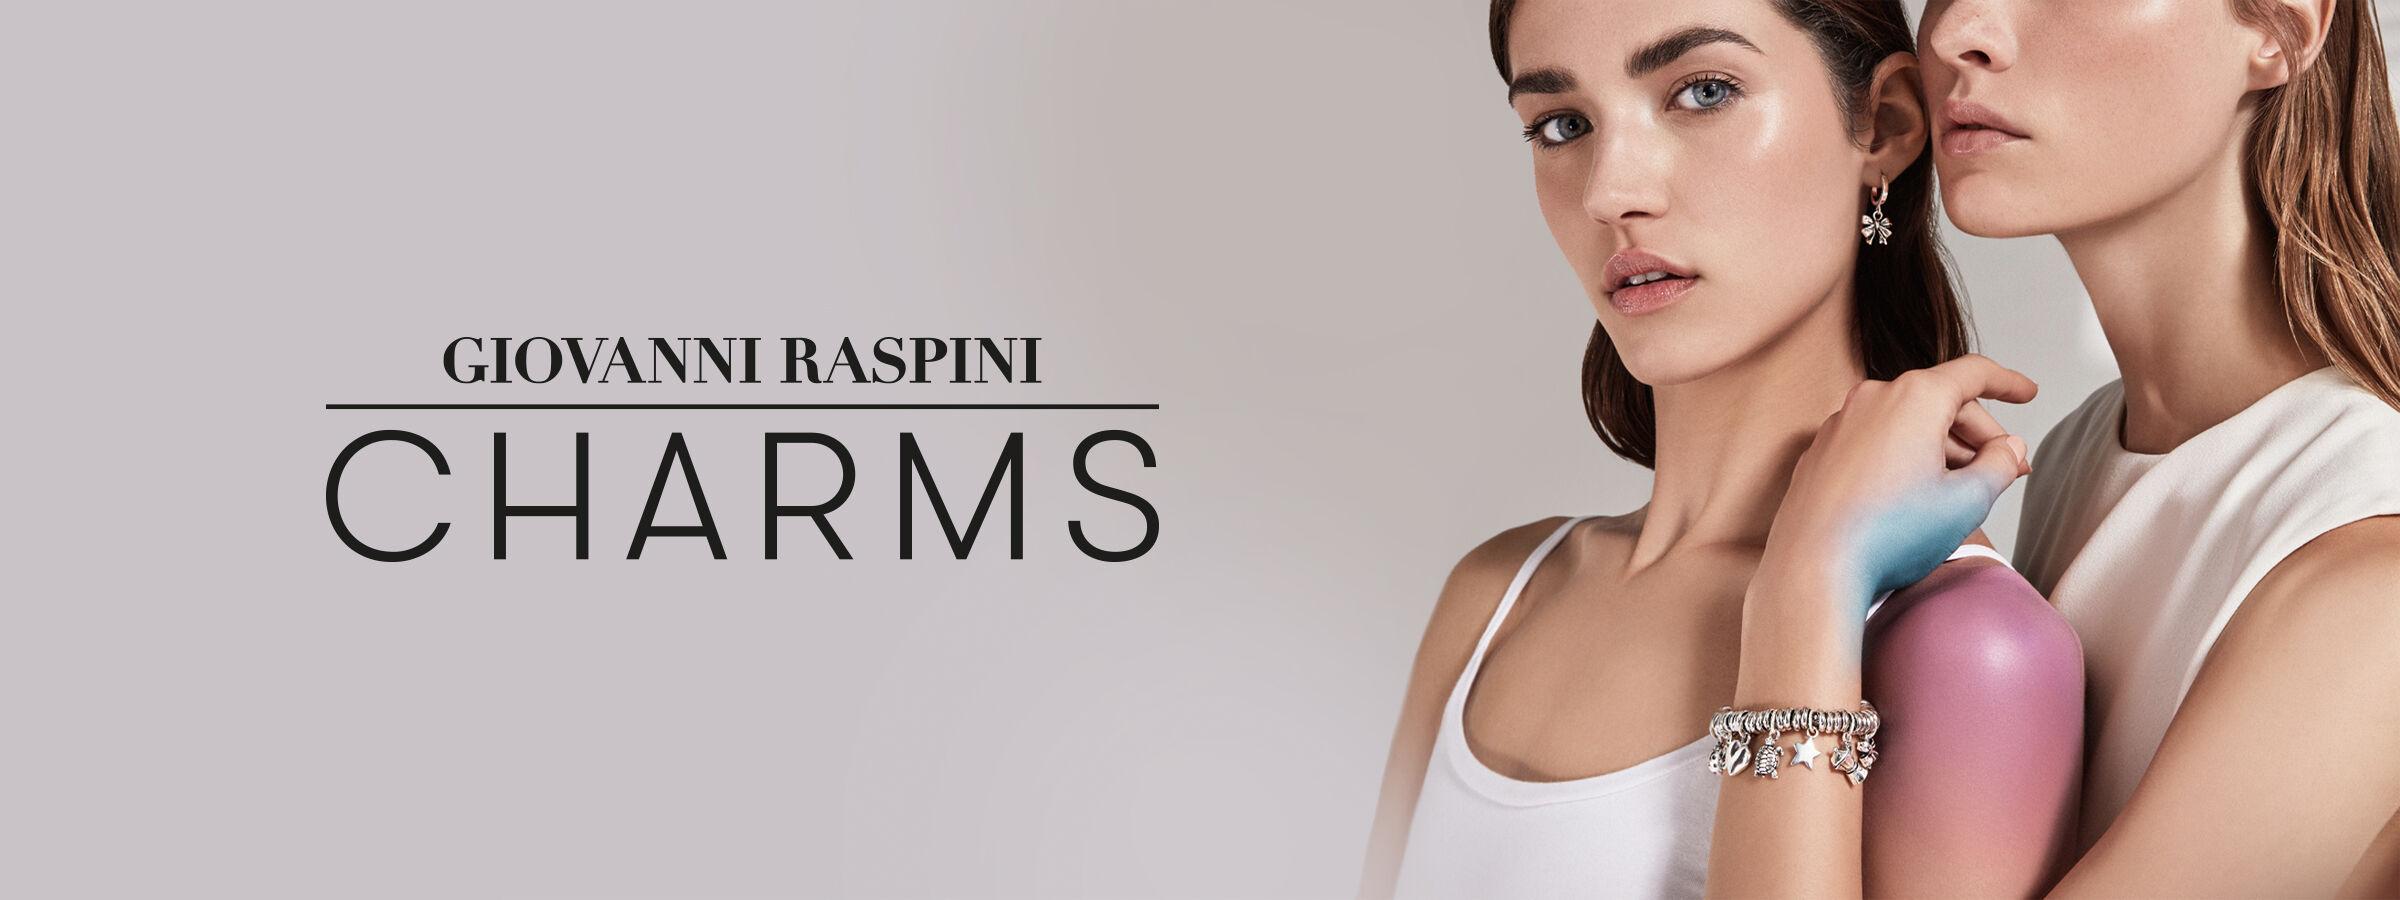 Giovanni Raspini Charms